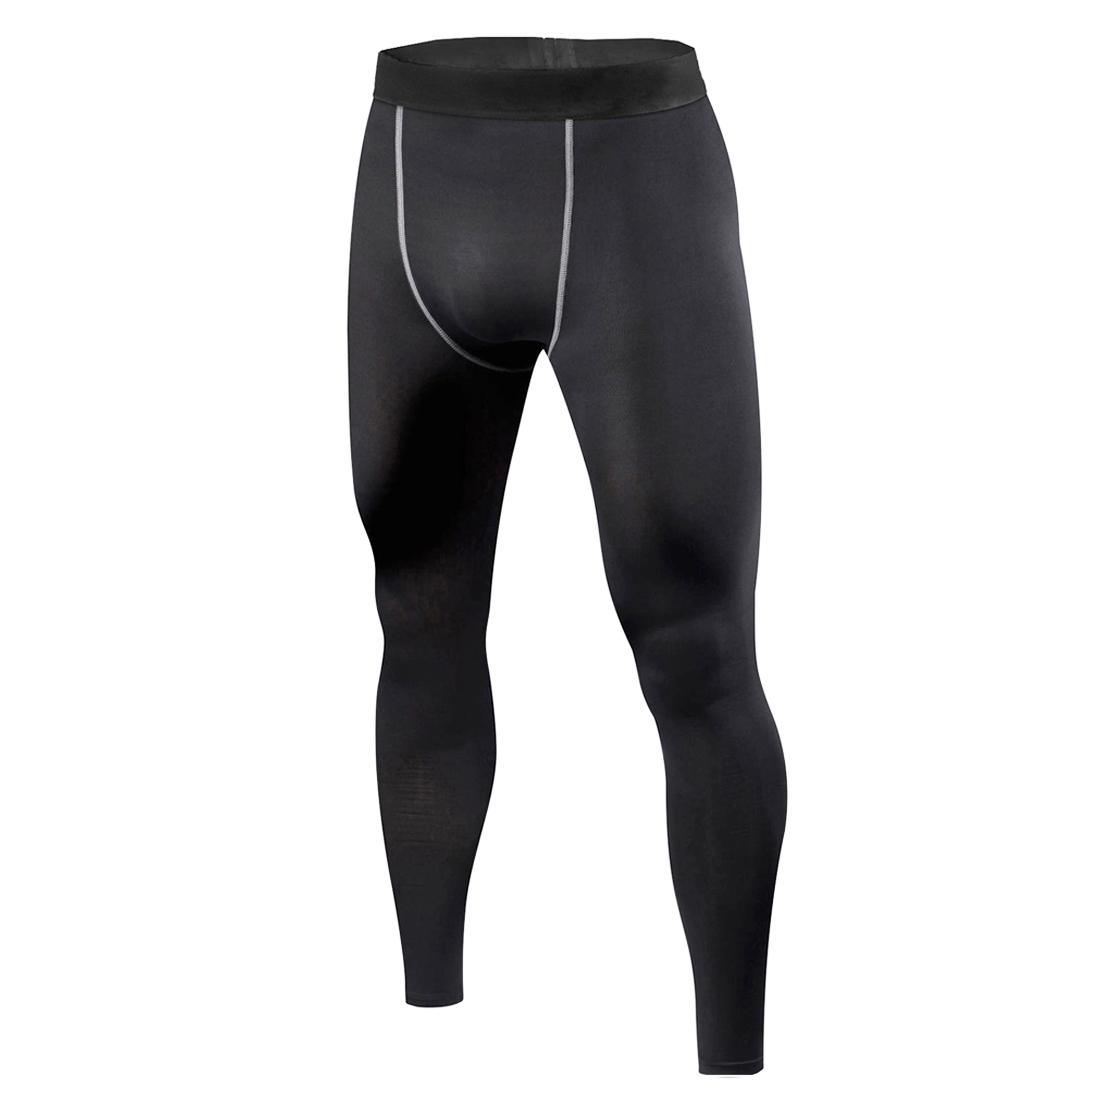 Mens Compression Shorts 3/4 Leggings Long Pants Trousers ...